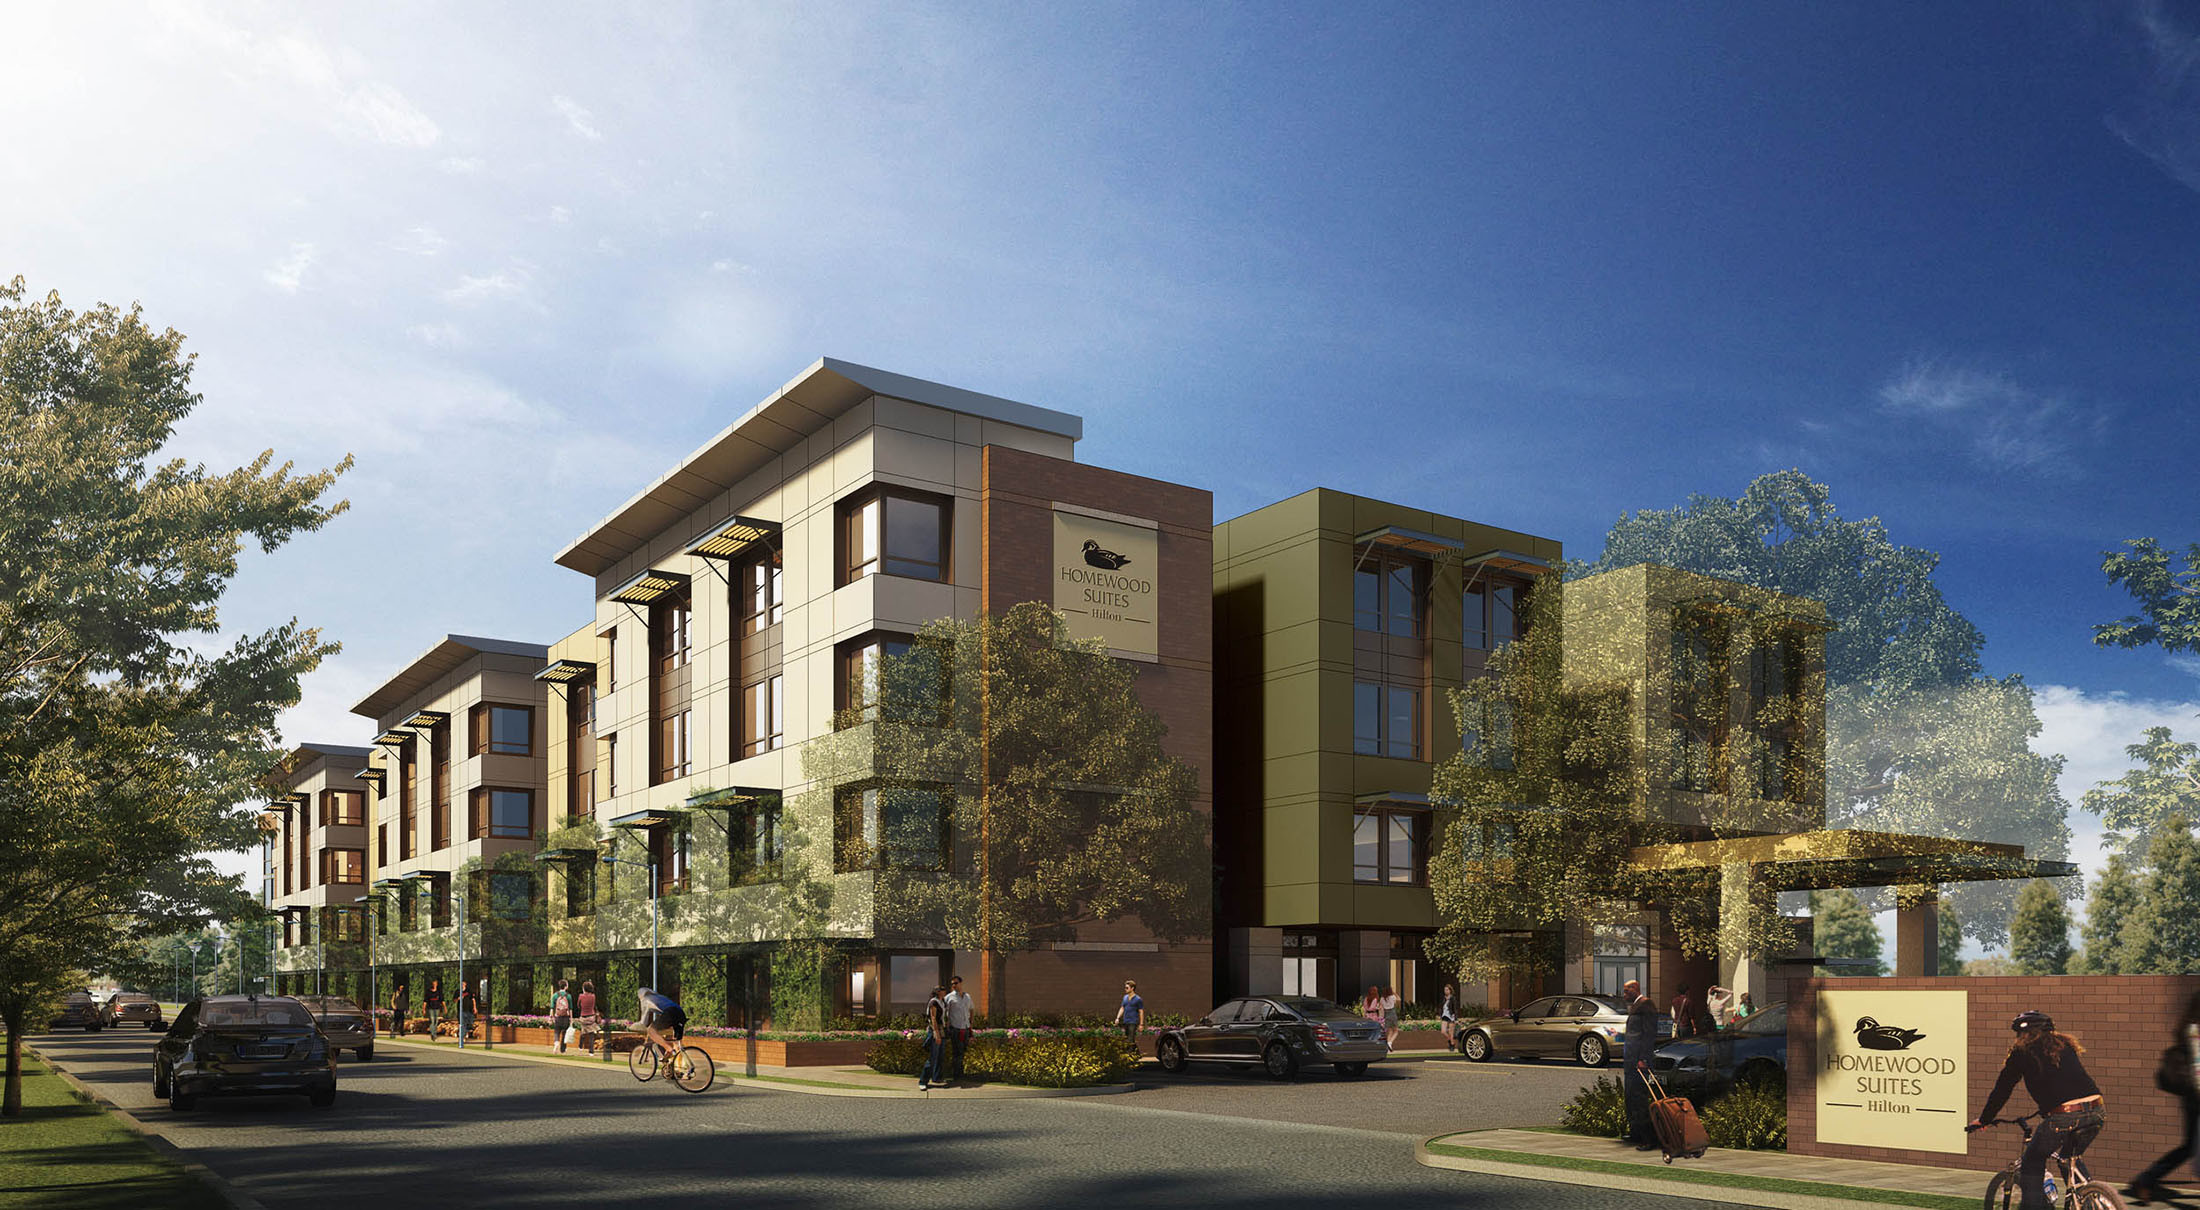 Exterior Homewood Suites Palo Alto Hotel Architecture Design ©brick-inc